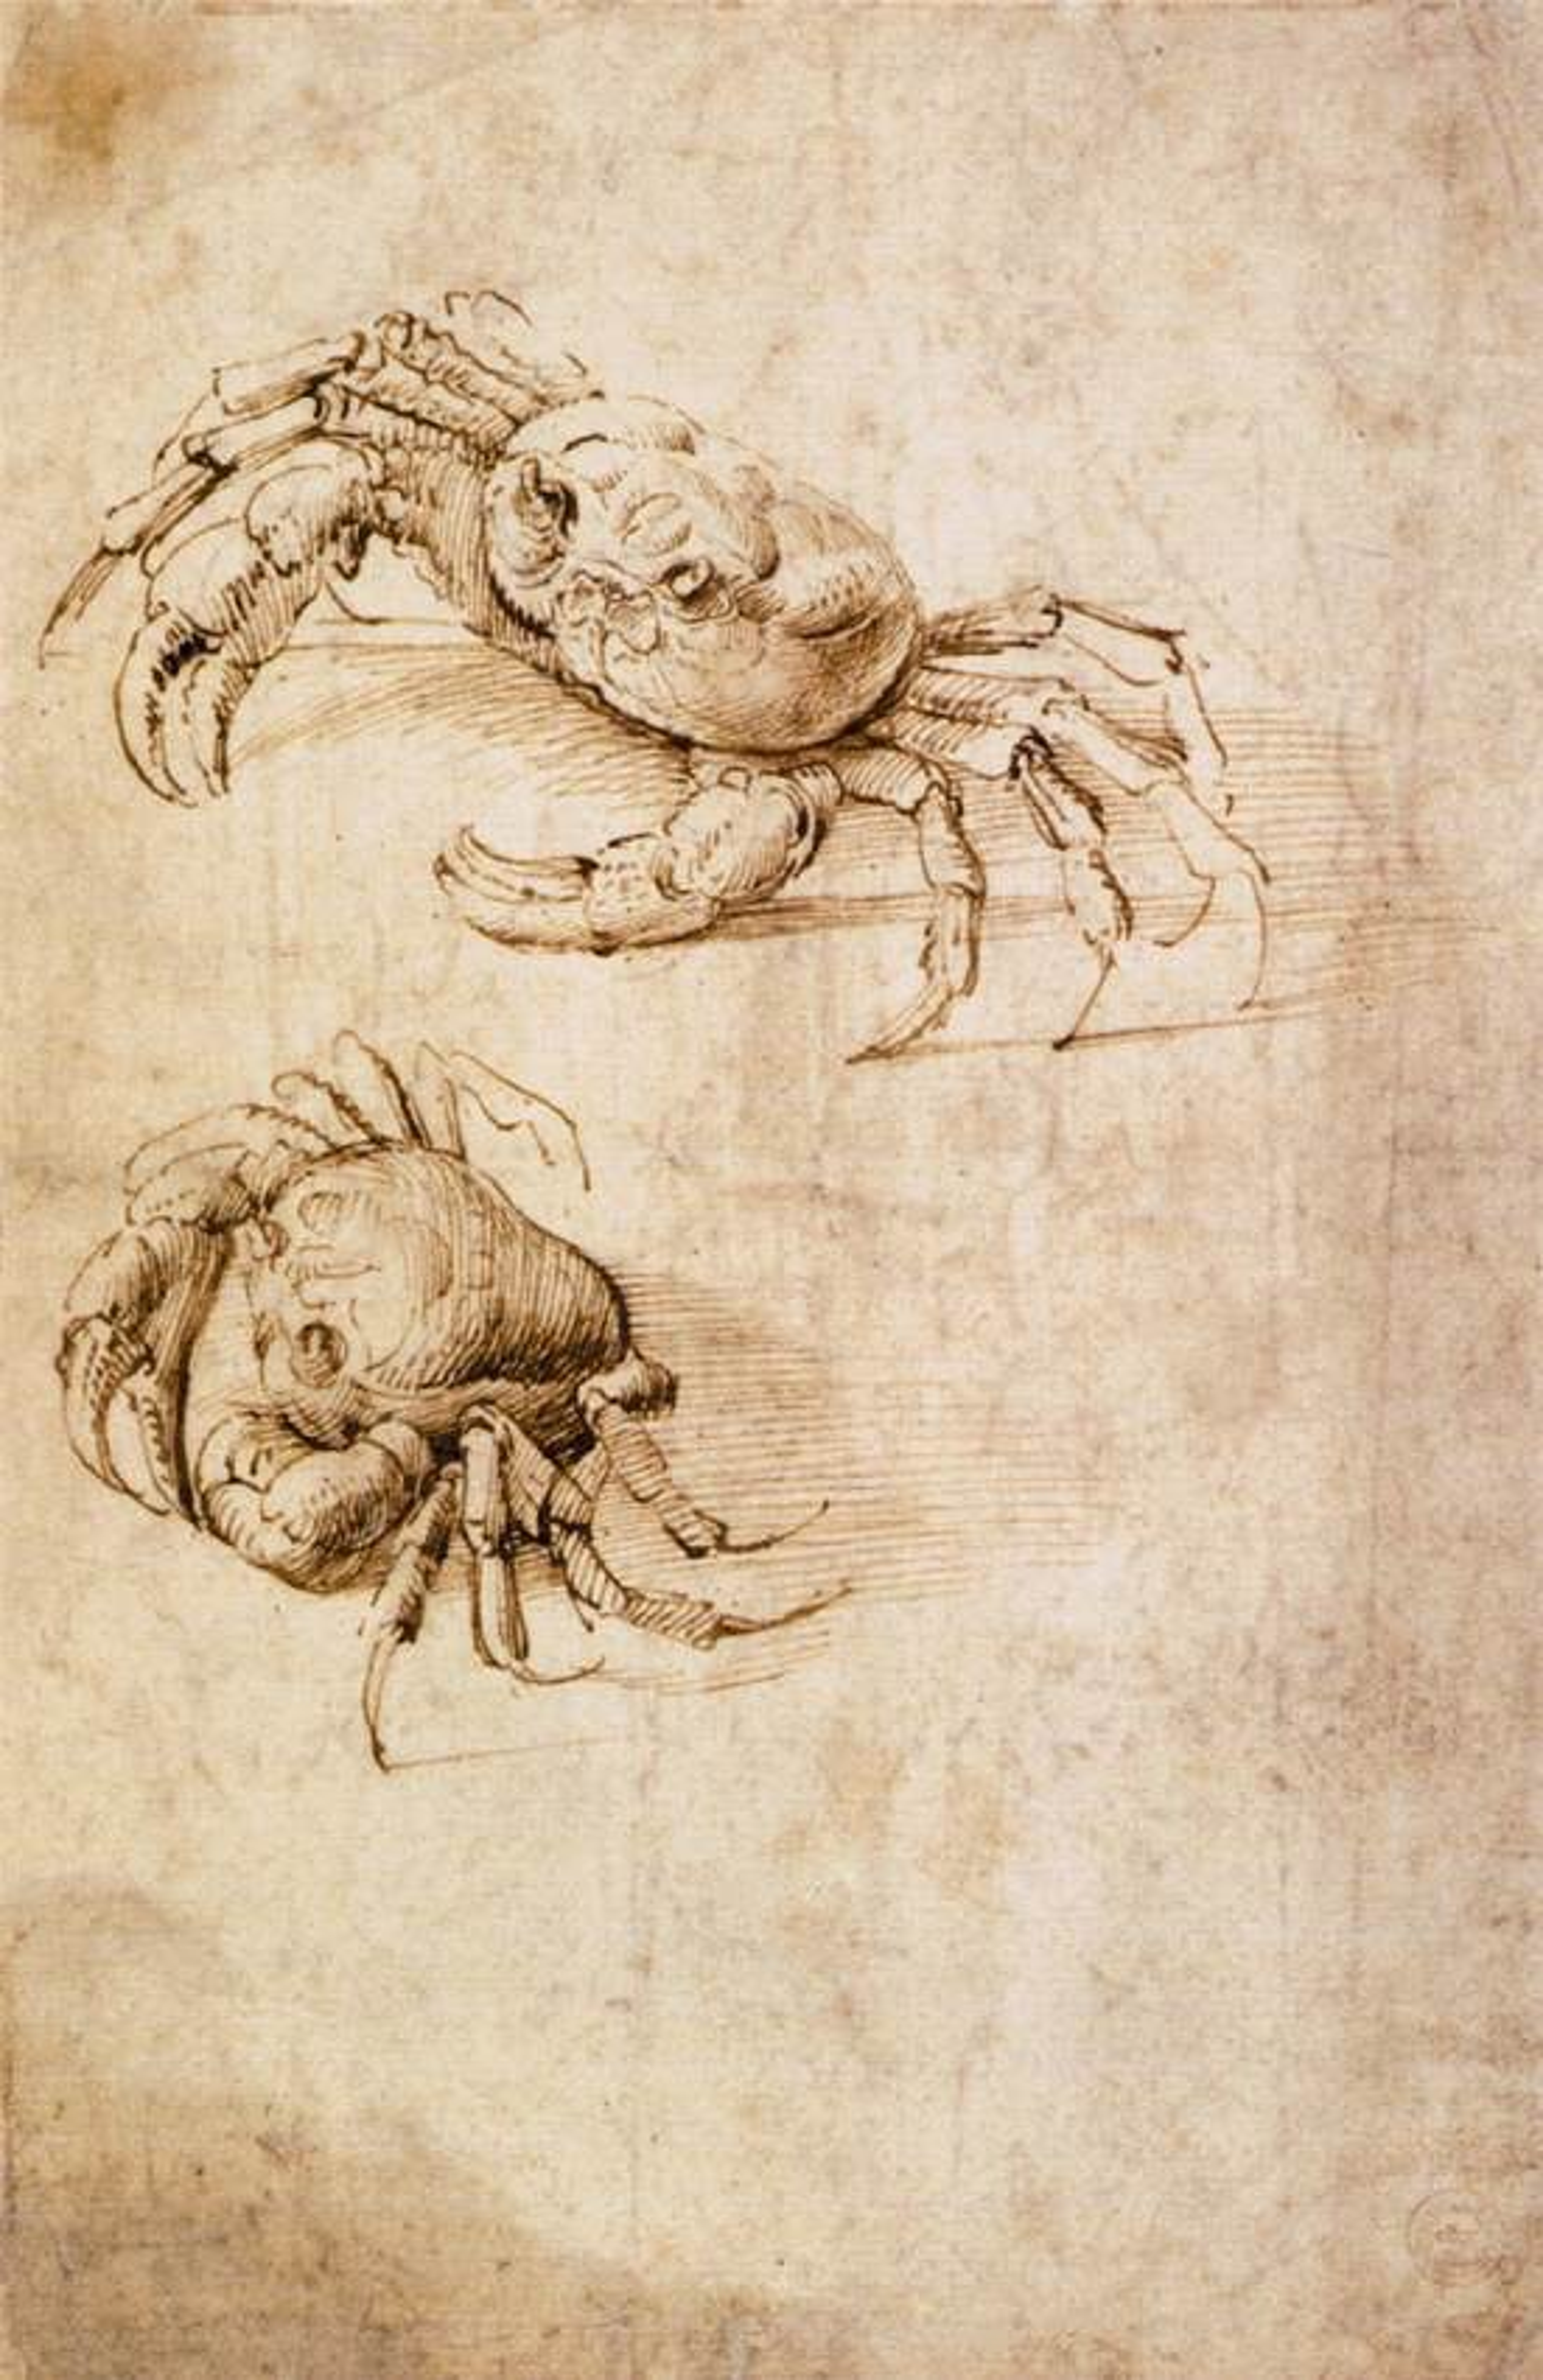 Leonardo da vinci art design